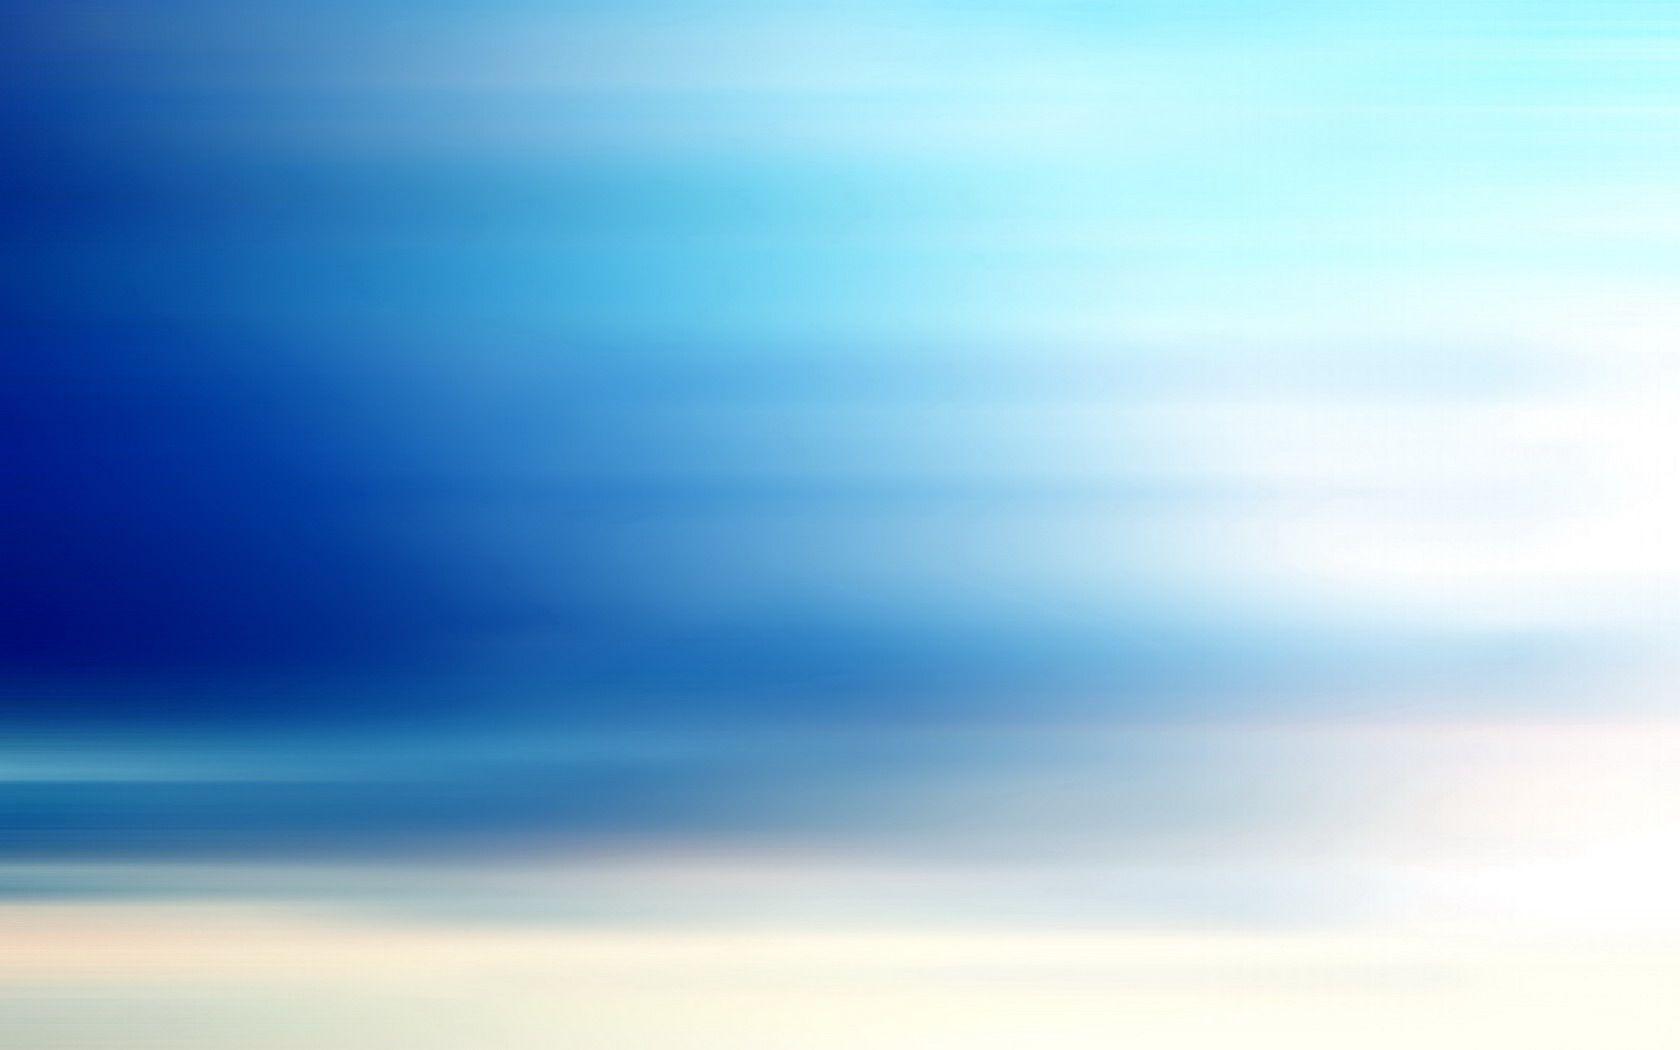 Hd Wallpaper Themes White Blue High Definition Wallpaper Hd Black And Blue Wallpaper Blue Background Wallpapers Blue And White Wallpaper